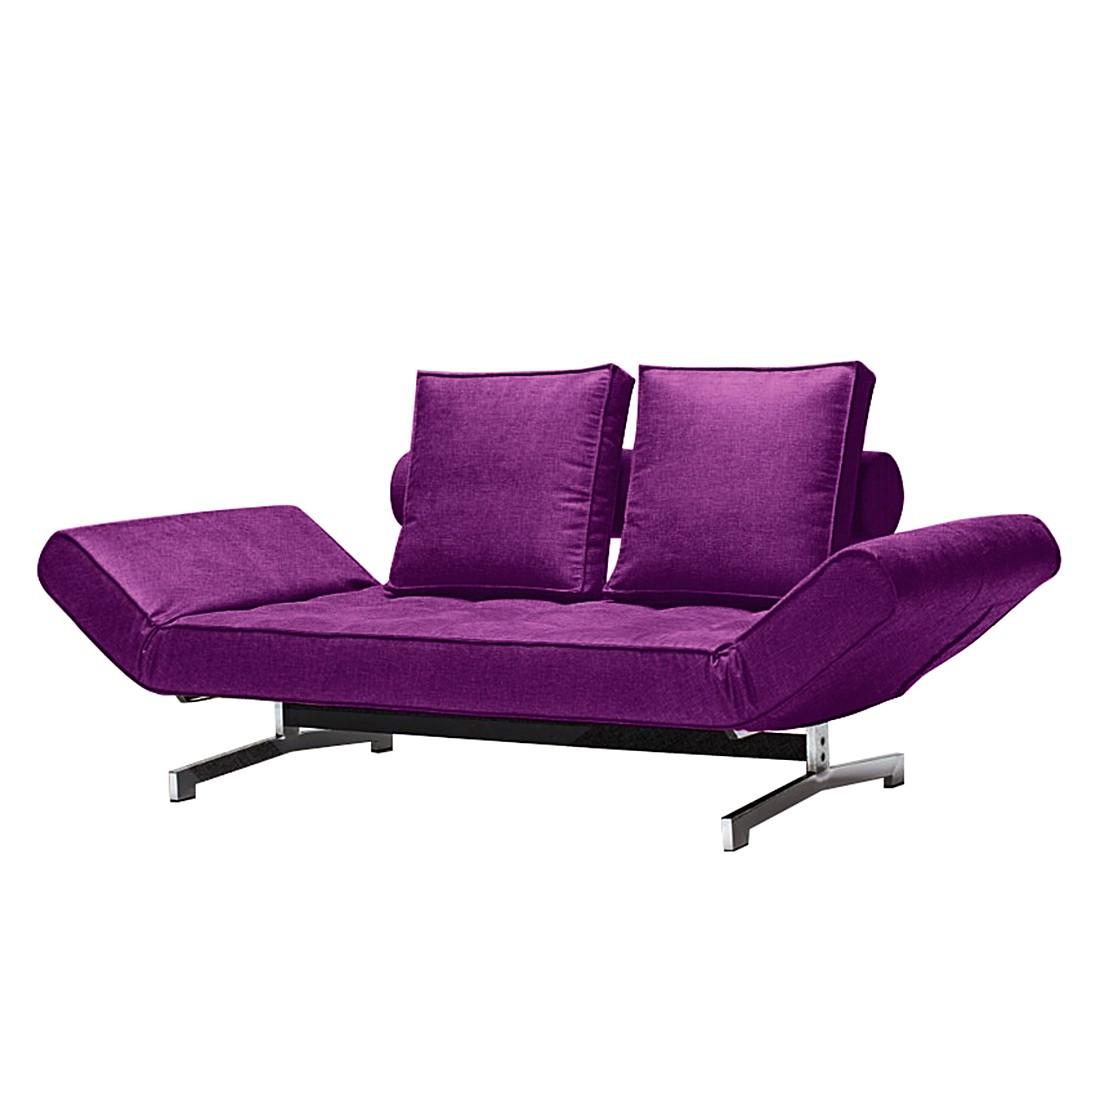 Schlafsofa Ghia – Webstoff Lila, Innovation Möbel bestellen